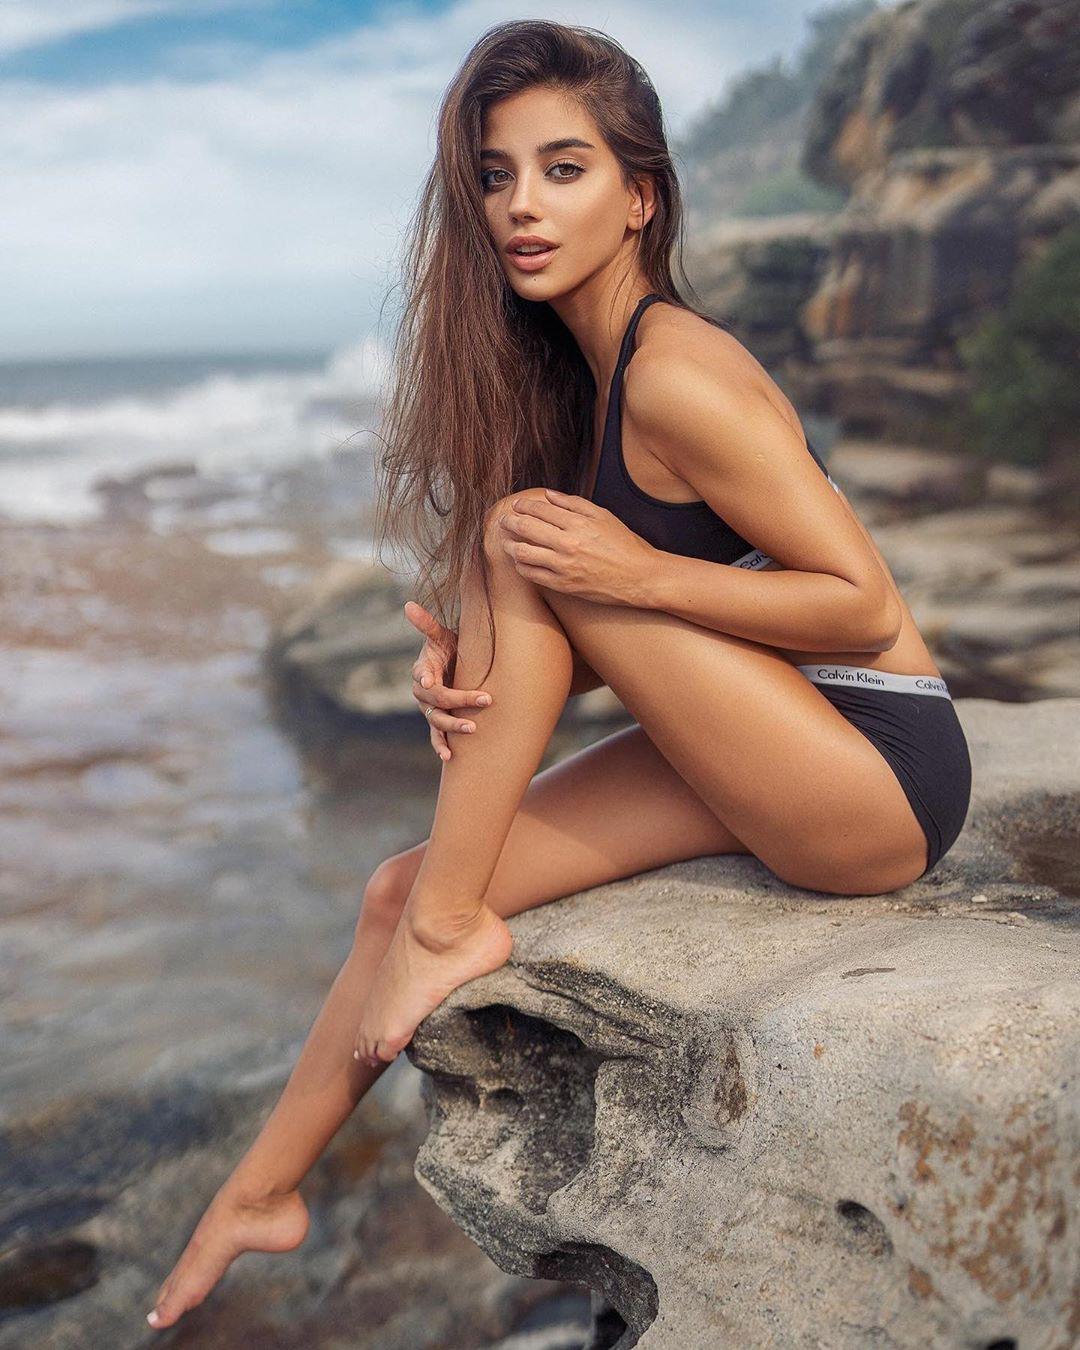 Maja Strojek bikini photos girls swimwear dresses ideas, instagram photoshoot